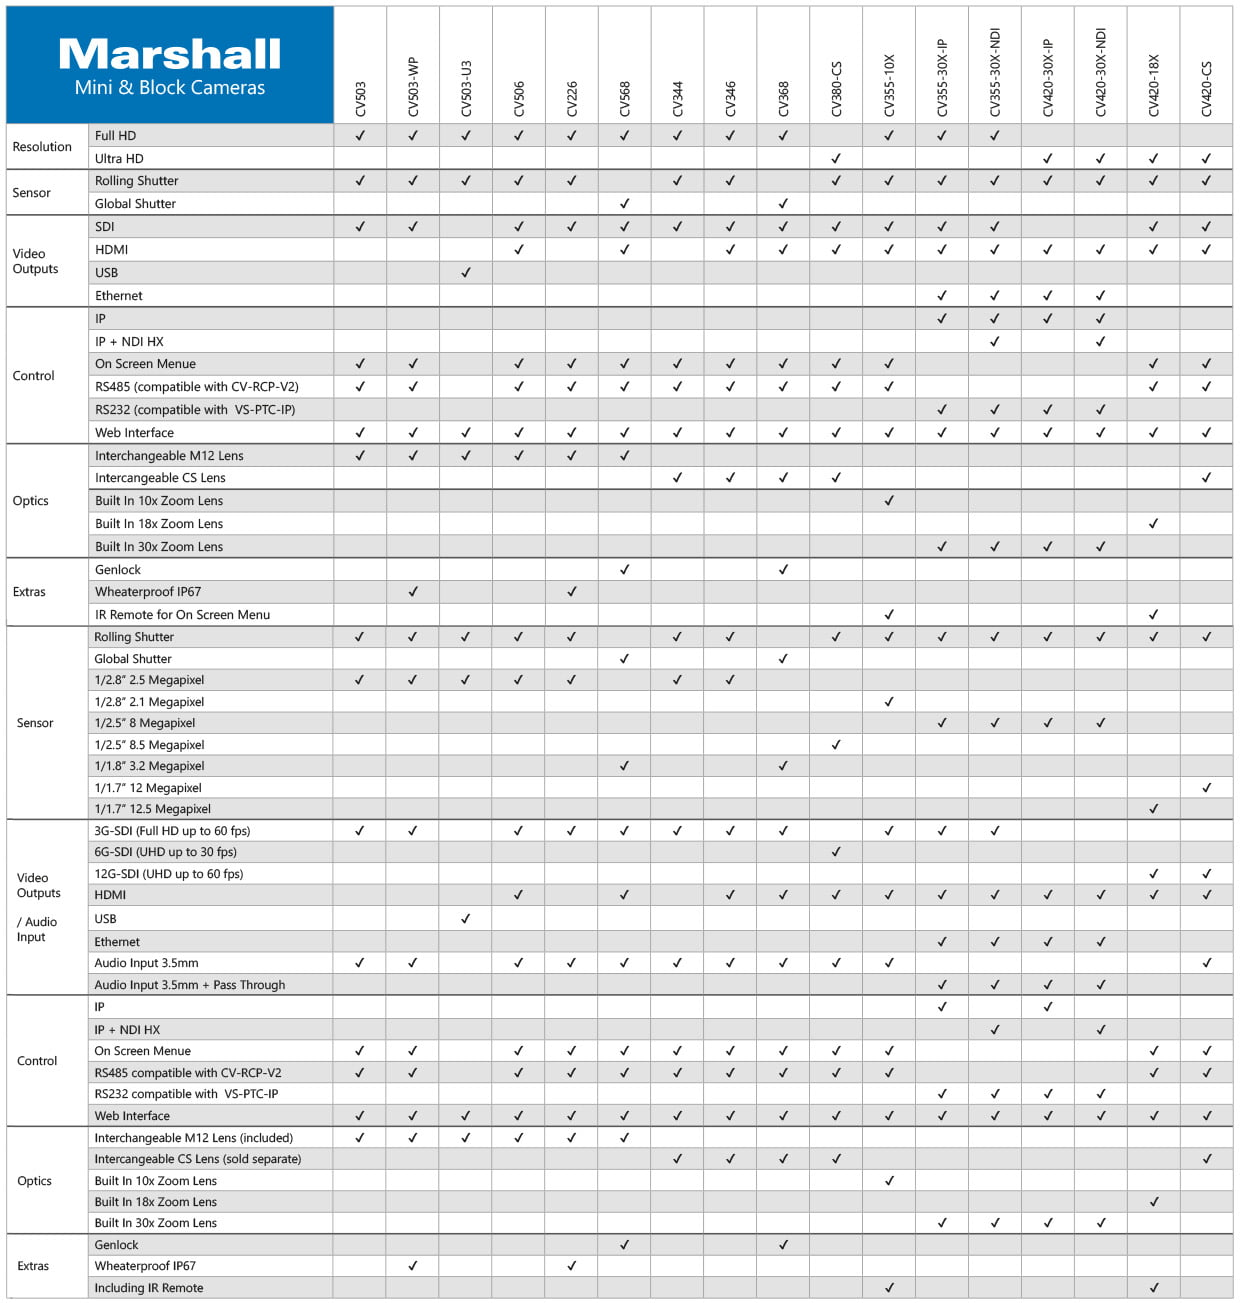 marshall_table01